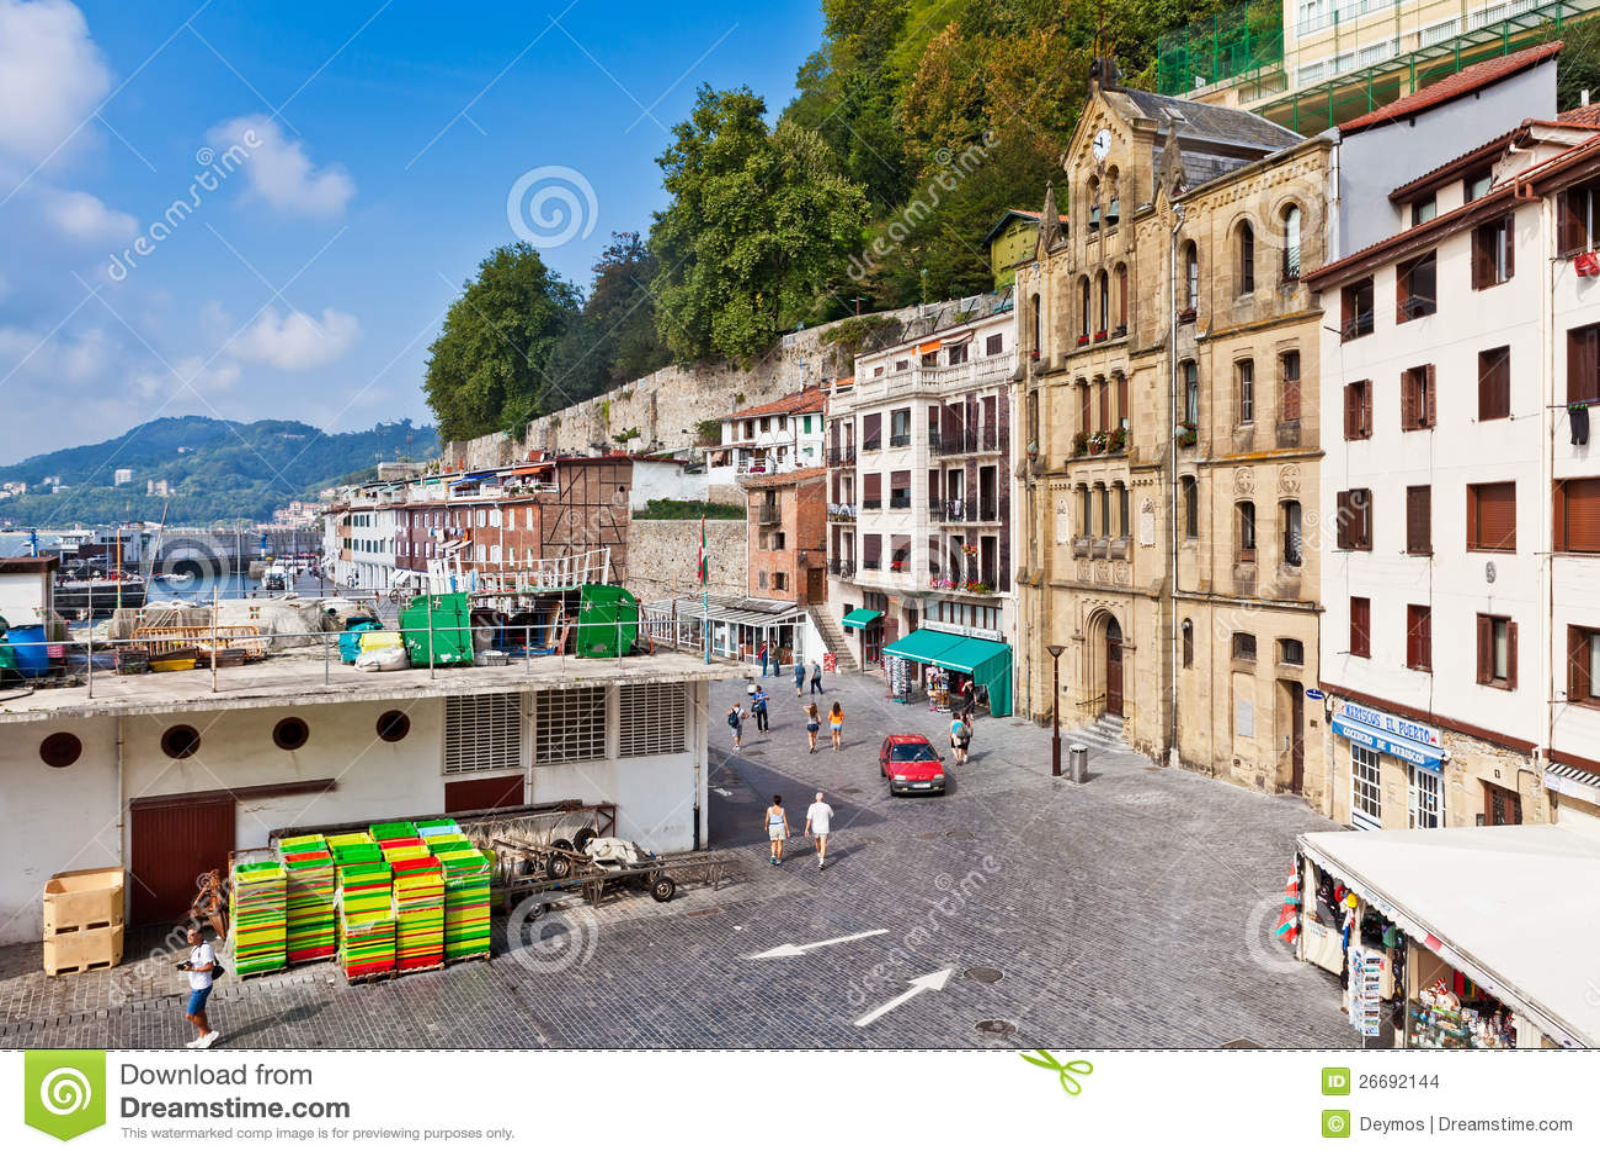 Vieux port de san sebastian espagne image stock ditorial - Office de tourisme san sebastian espagne ...